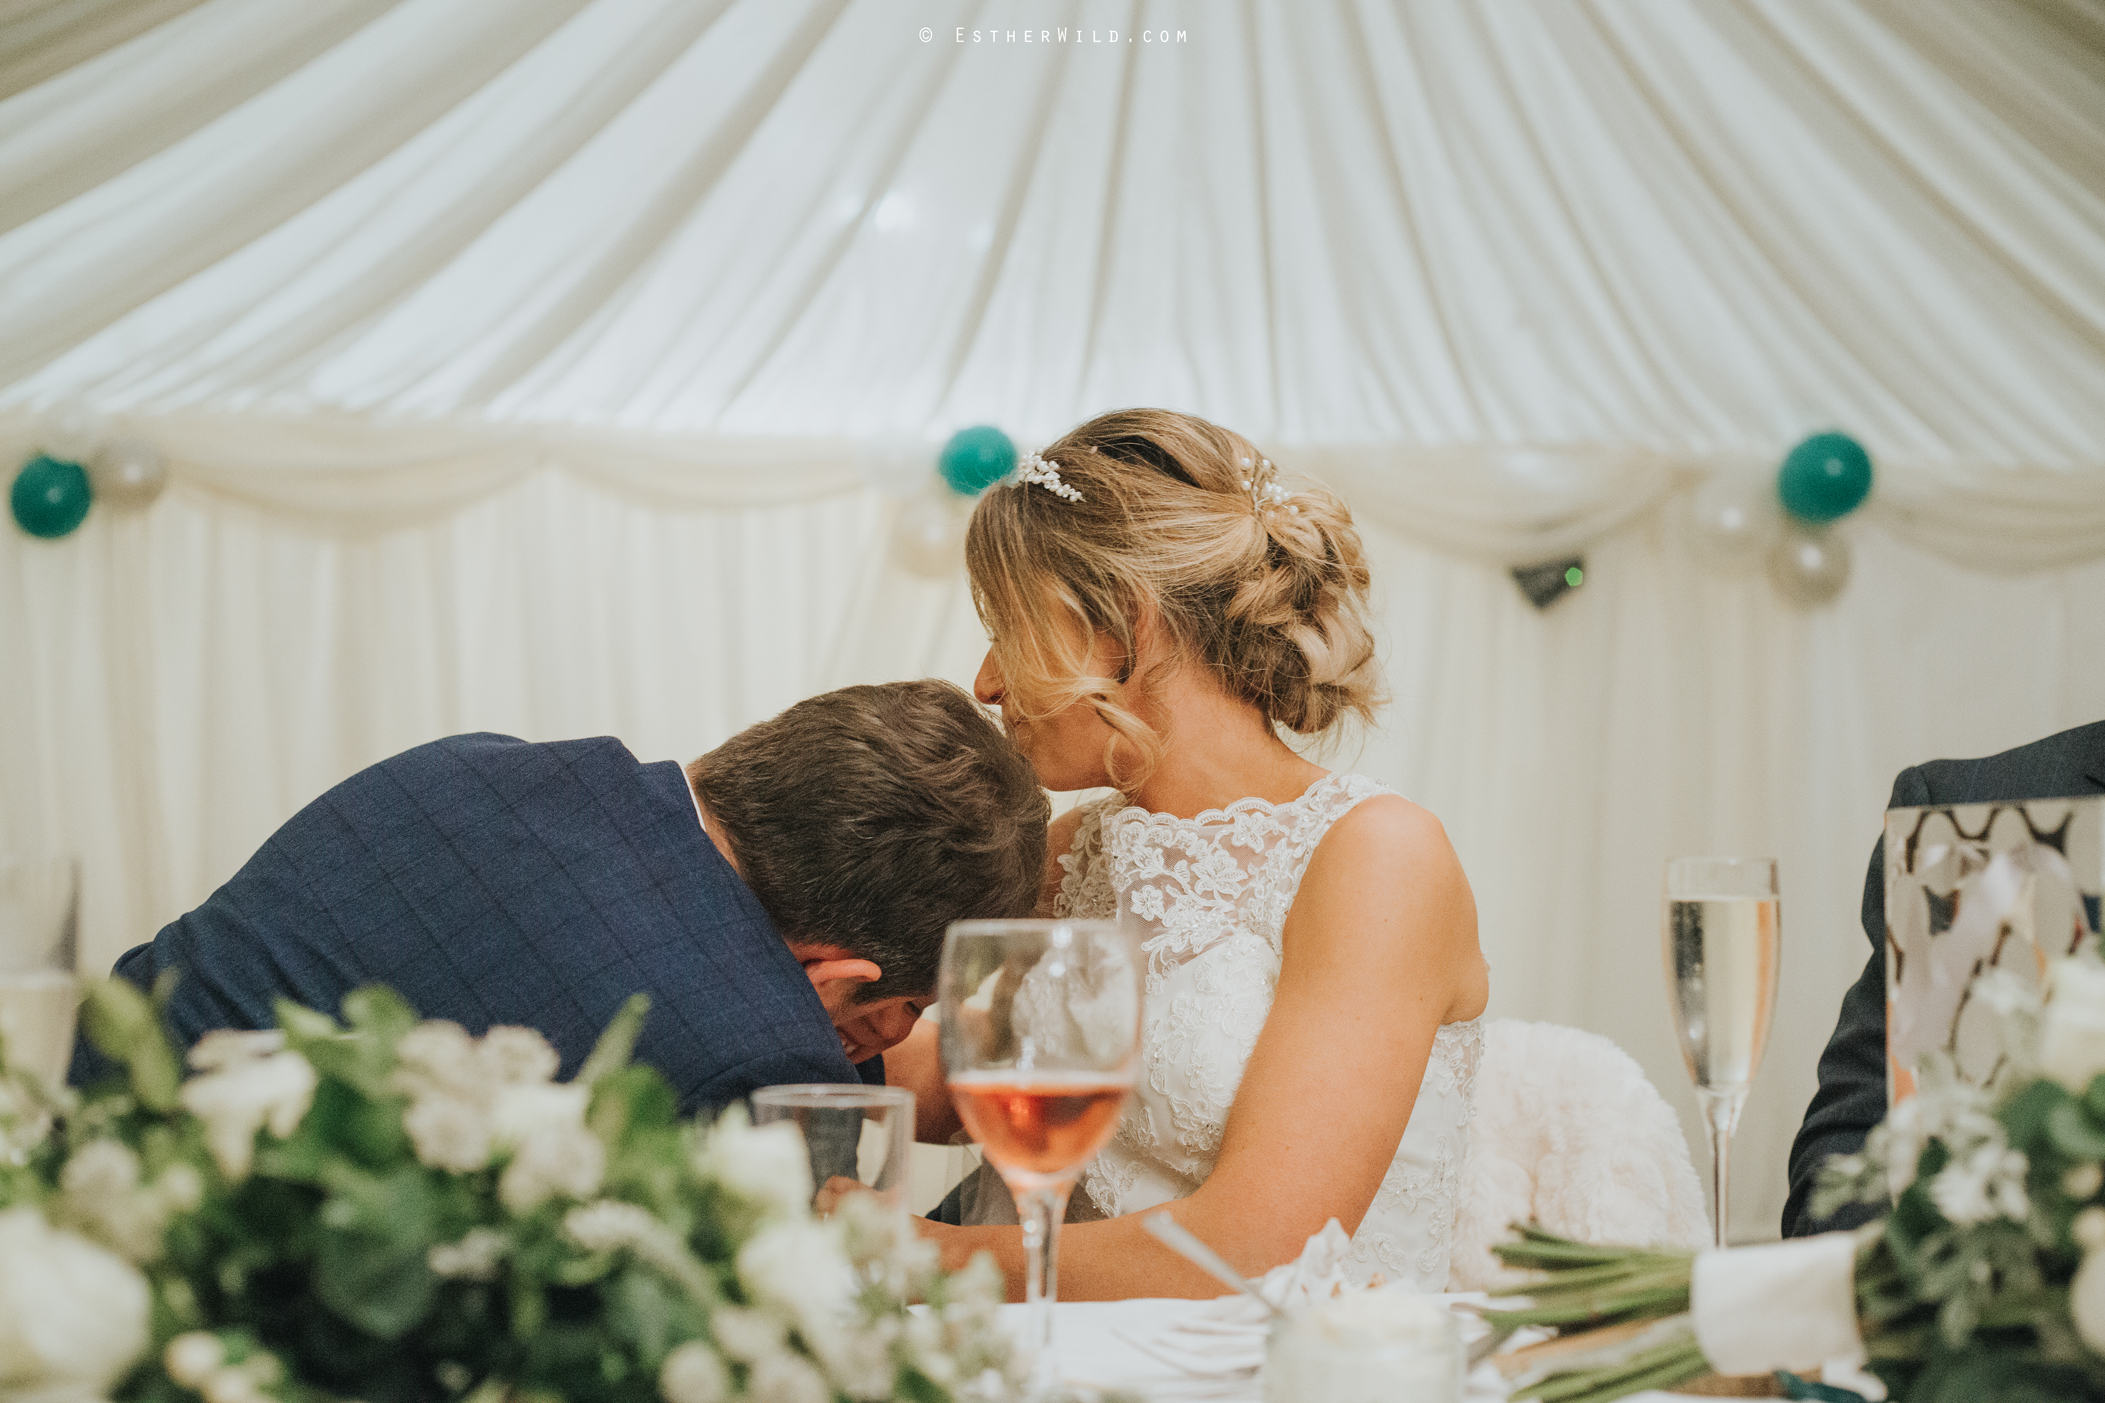 Wedding_Photography_Diss_Gawdy_Hall_Redenhall_Church_Norfolk_Winter_Esther_Wild_Copyright_IMG_2112_IMGL1743.jpg